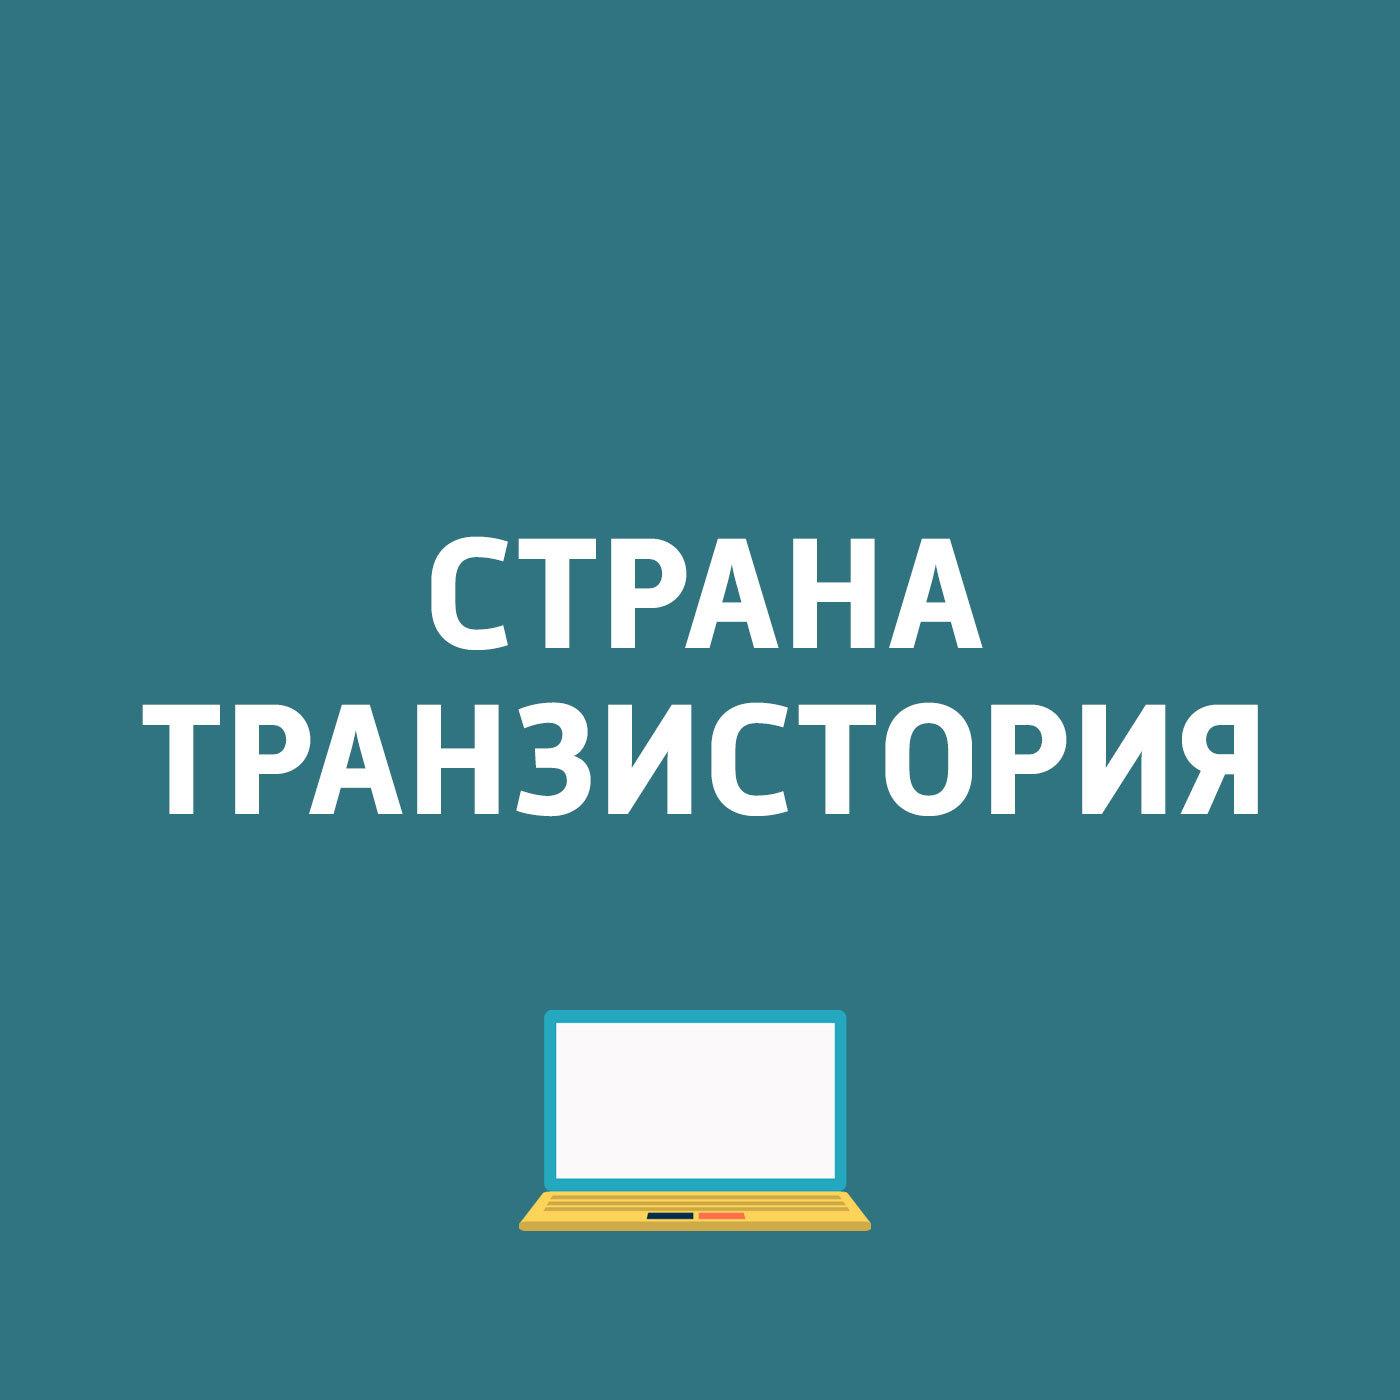 Картаев Павел остановил производство телефона Galaxy Note 7...